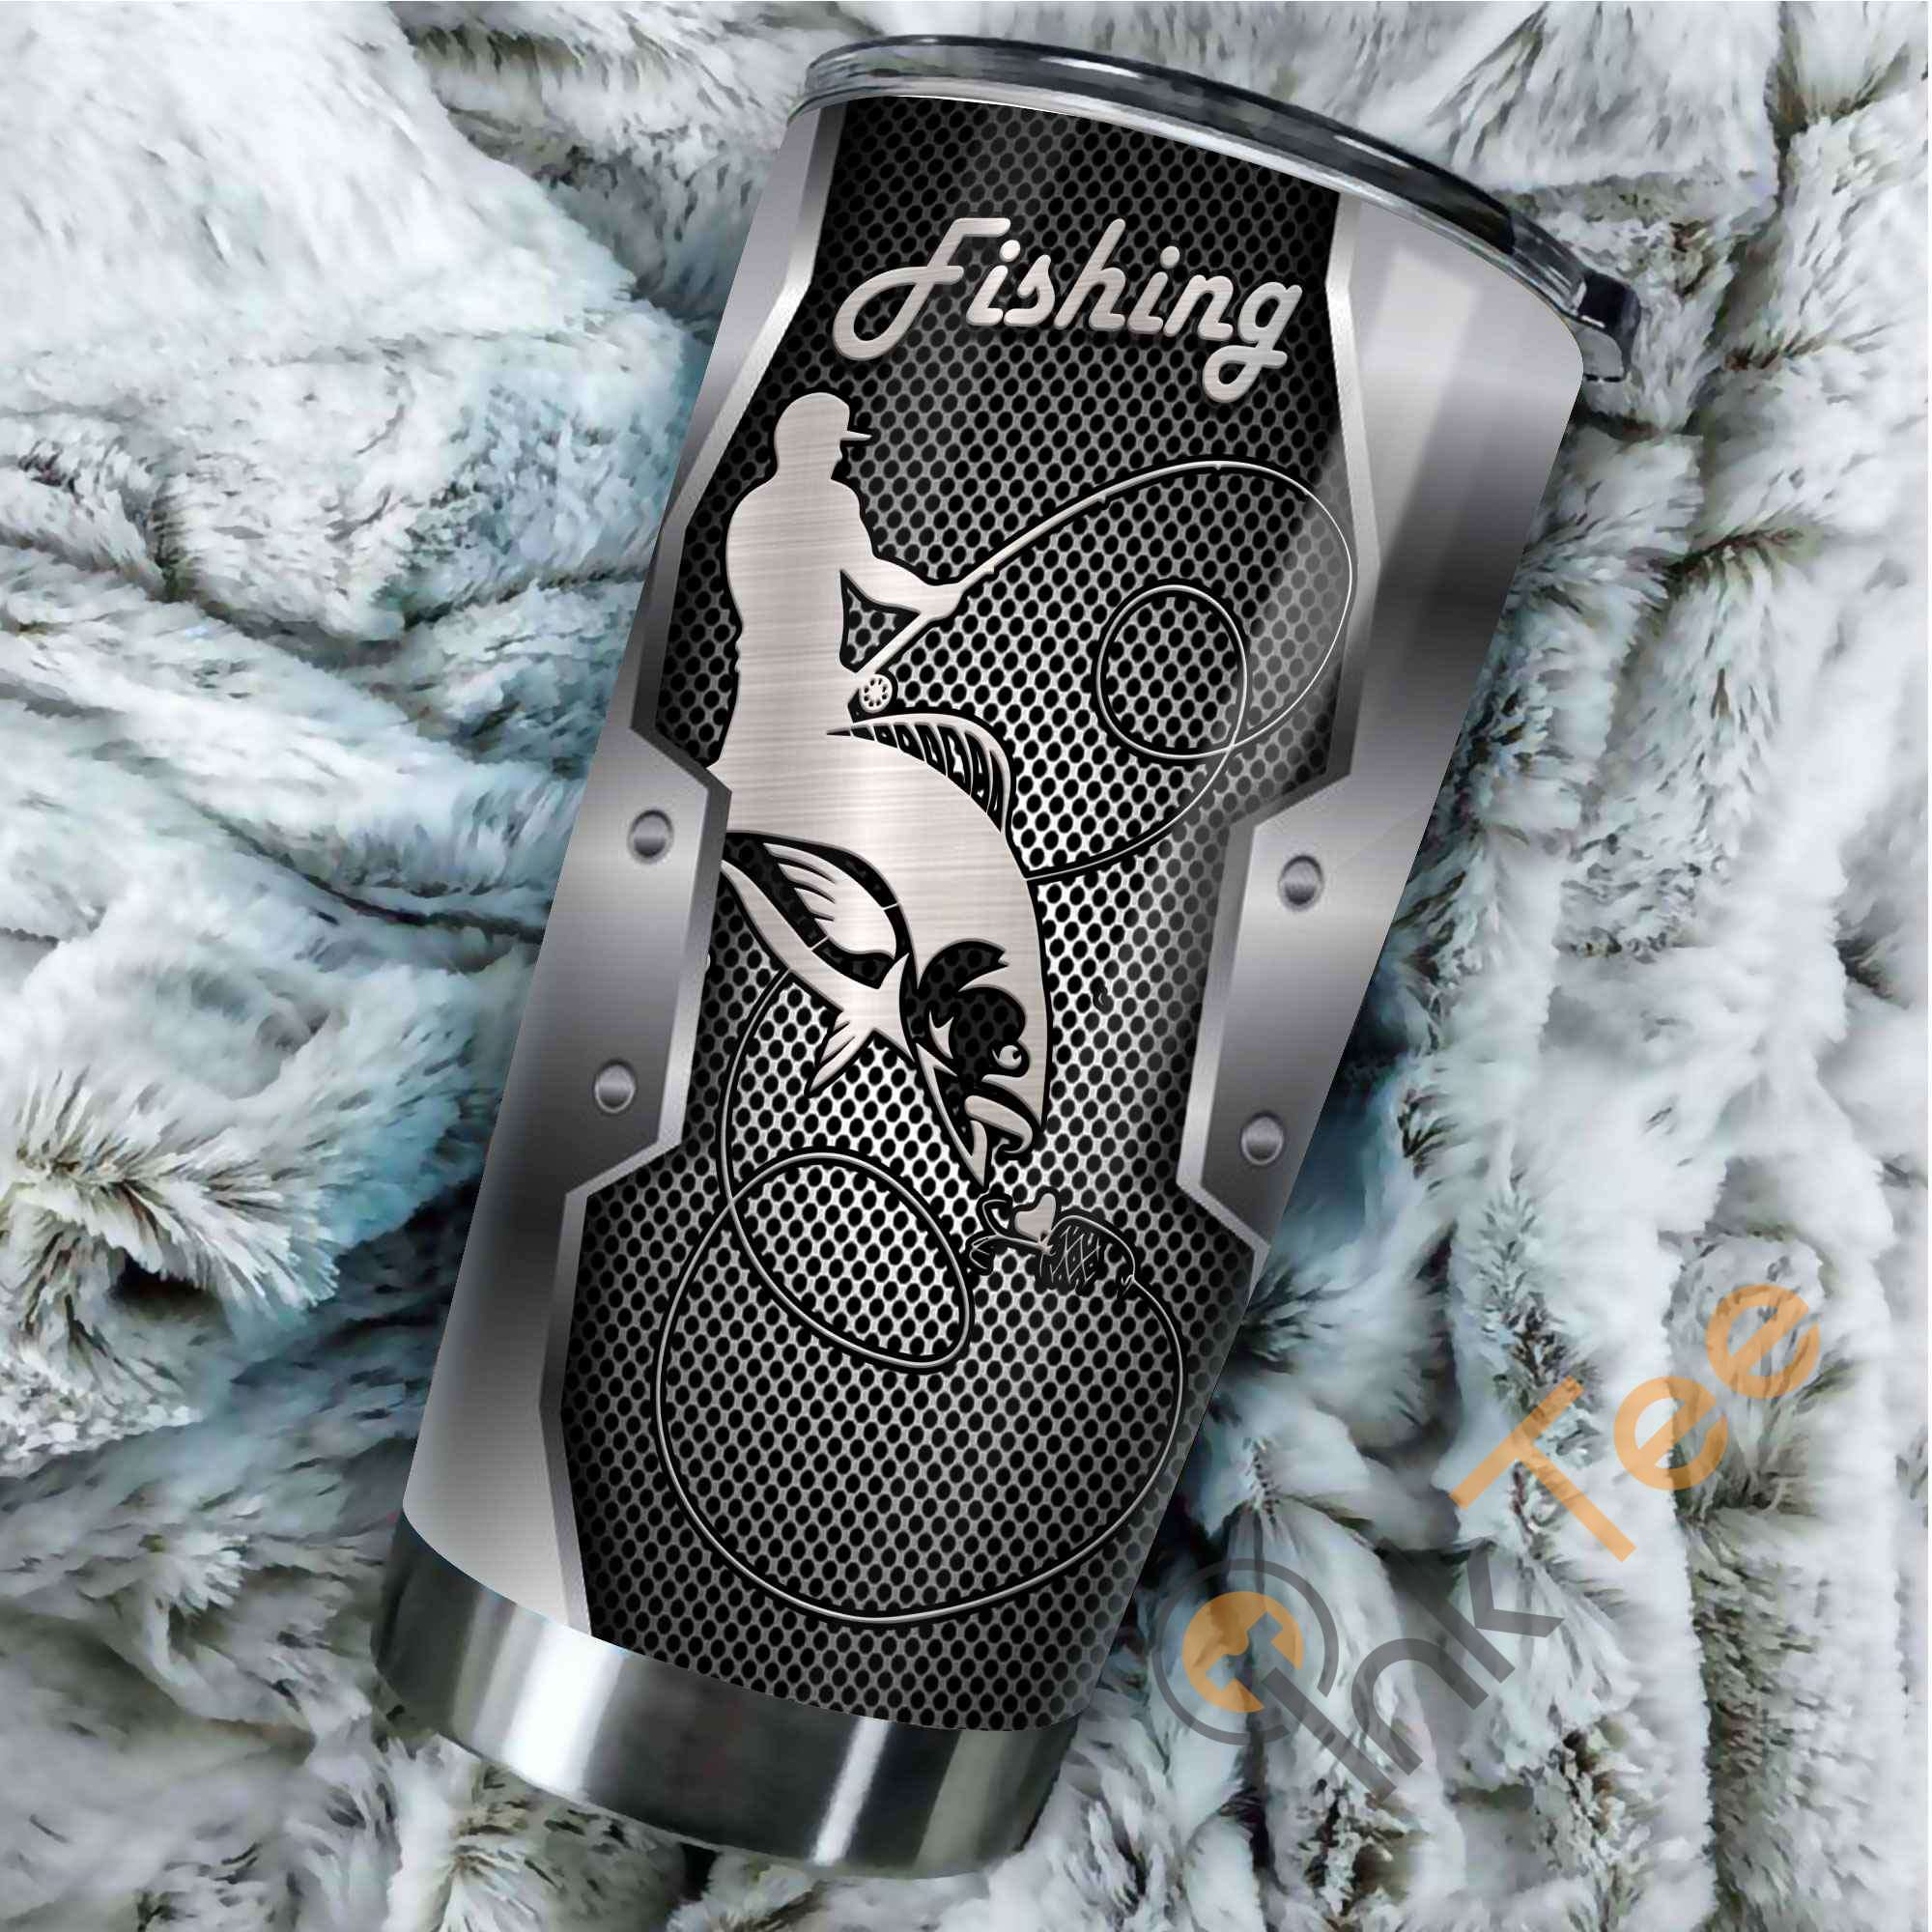 Fishing Metal Amazon Best Seller Sku 2591 Stainless Steel Tumbler